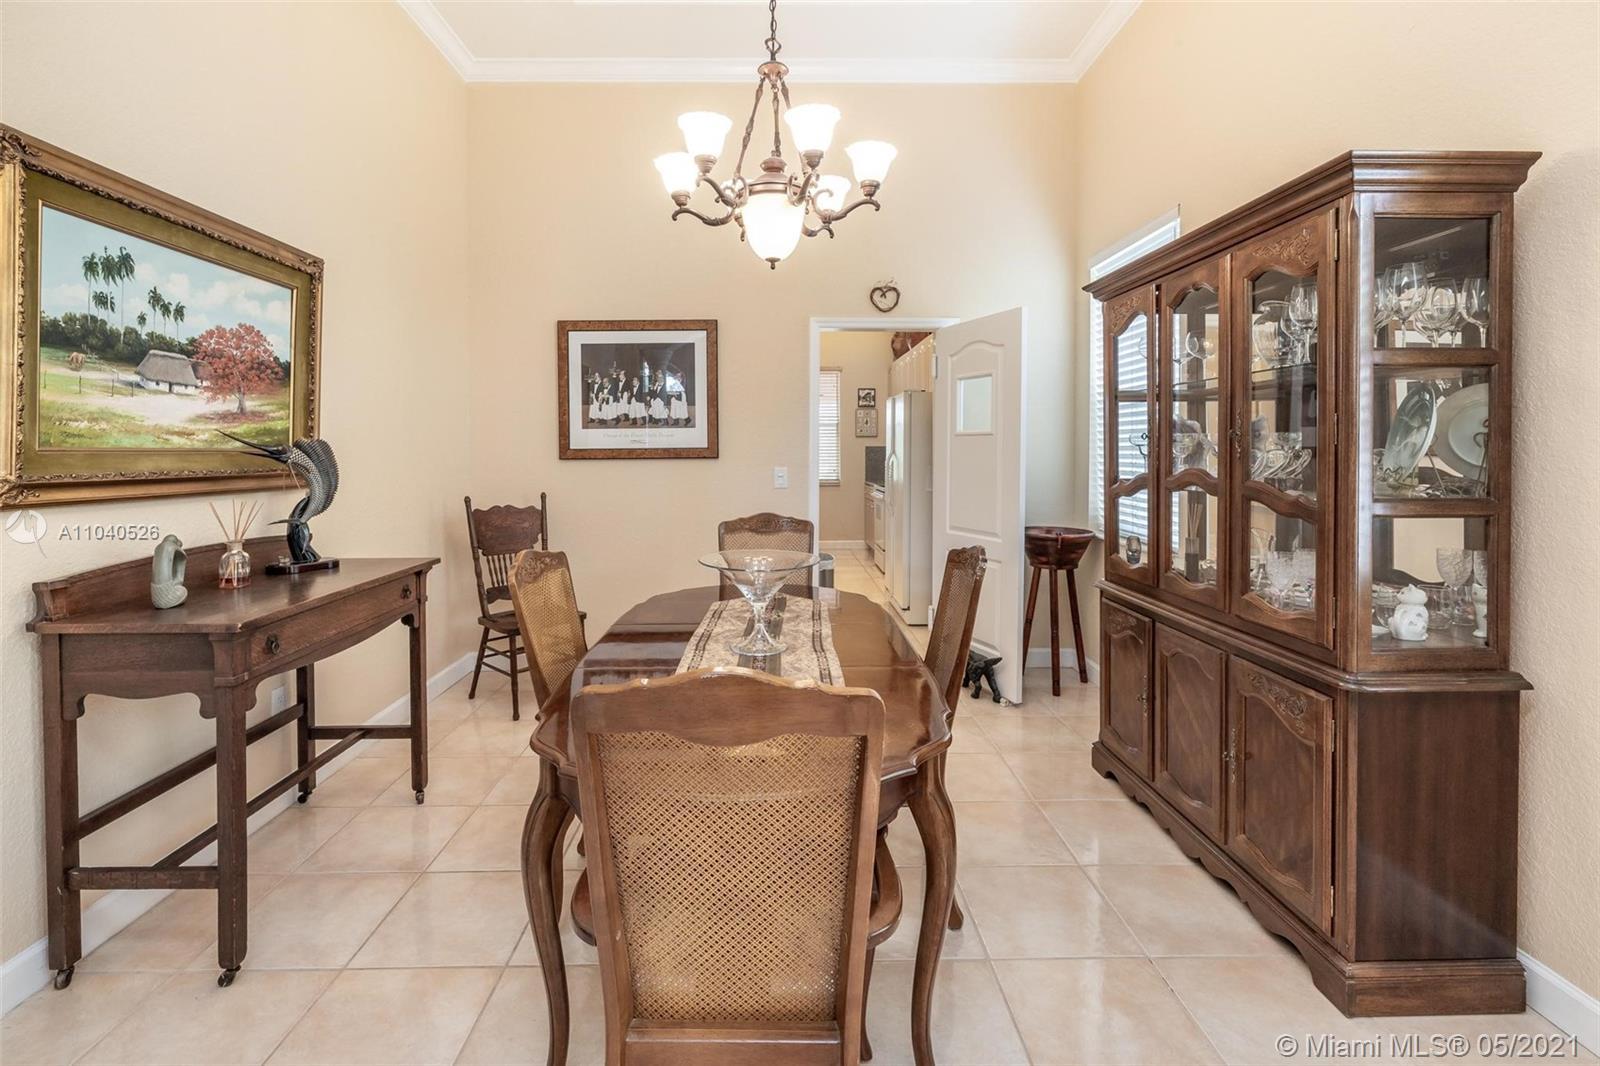 Spring Valley Homes - Pembroke Pines Florida Real Estate ...